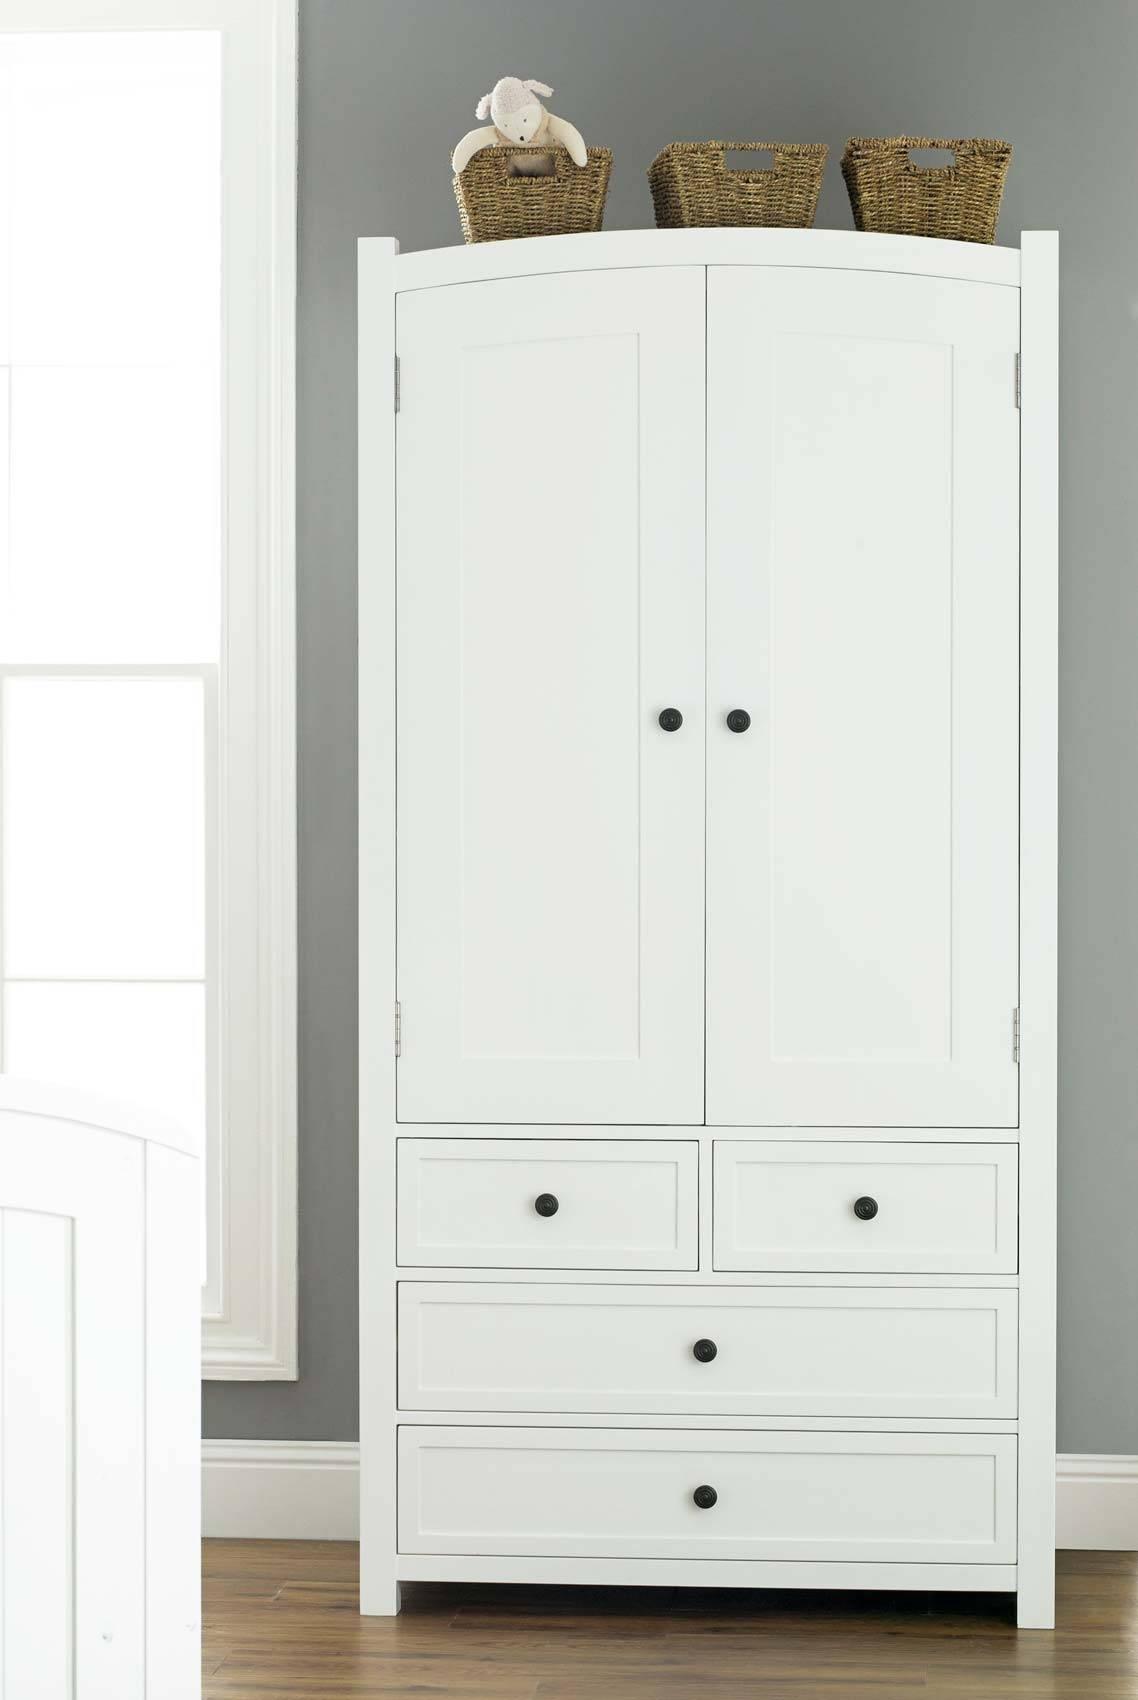 Wardrobe : 36 Awful Large White Wardrobe With Drawers Picture within White Wardrobes With Drawers (Image 12 of 15)